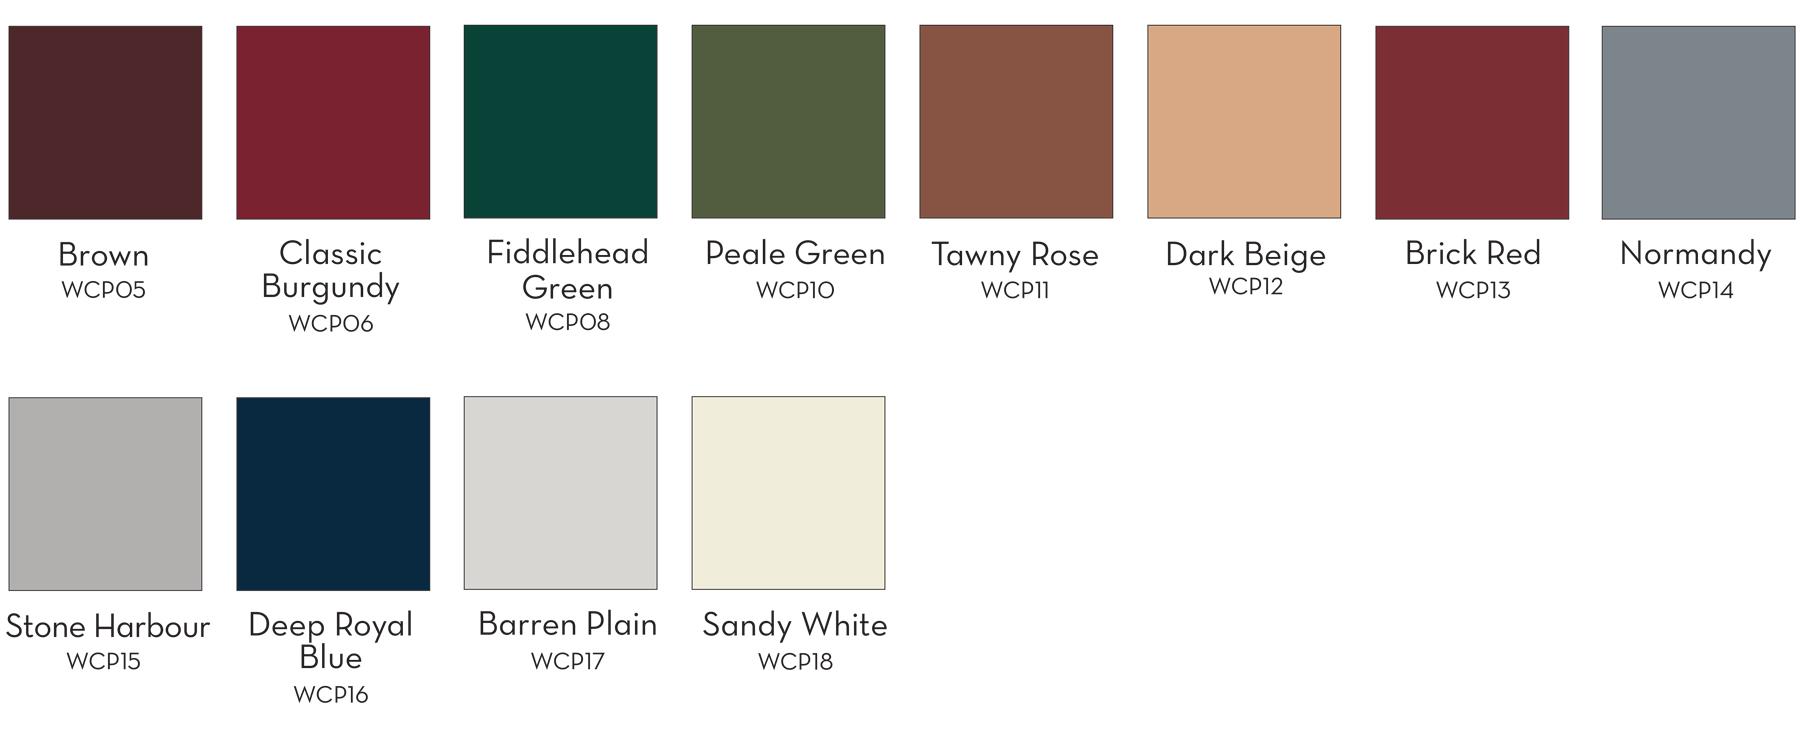 Product Colors - Paint Options